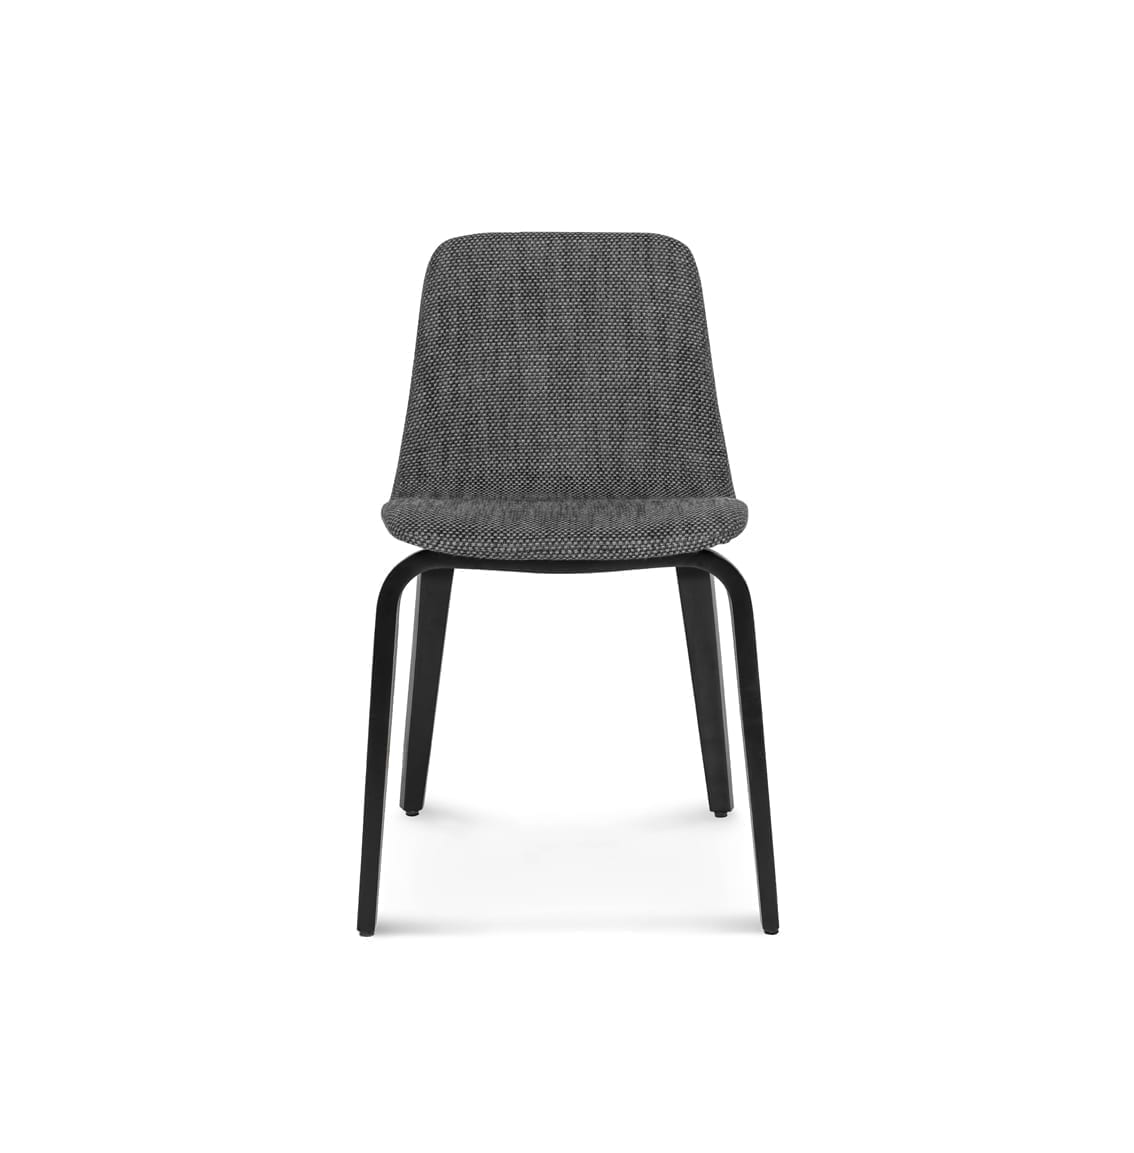 Fameg_krzesło_A-1802_Hips_tapicerowane